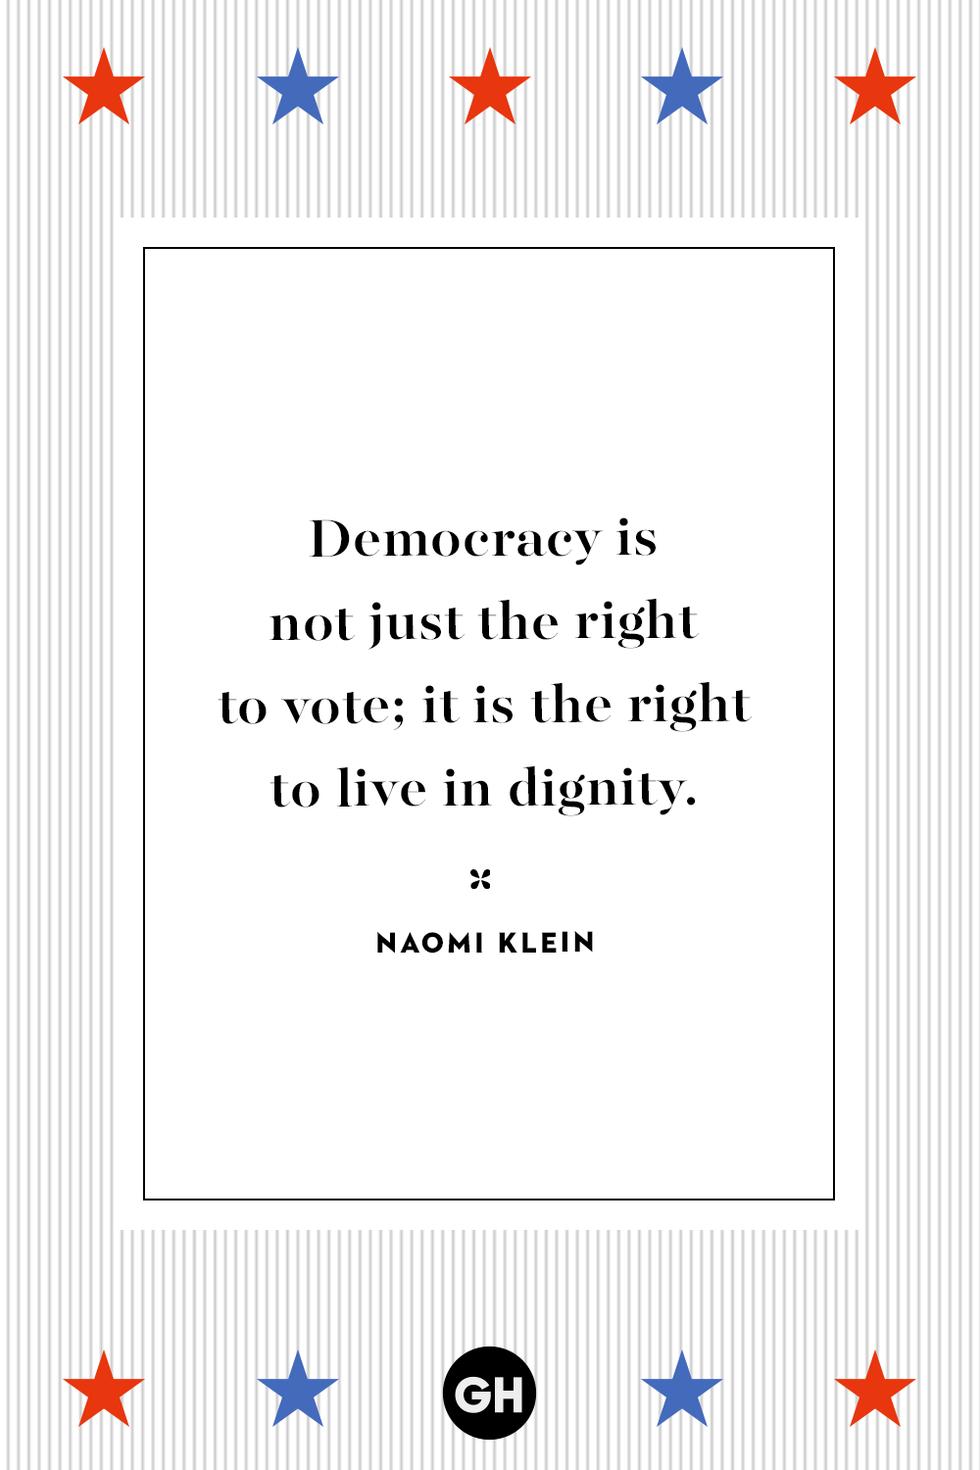 election-quotes-voting-quotes-16-naomi-klein-1567019364